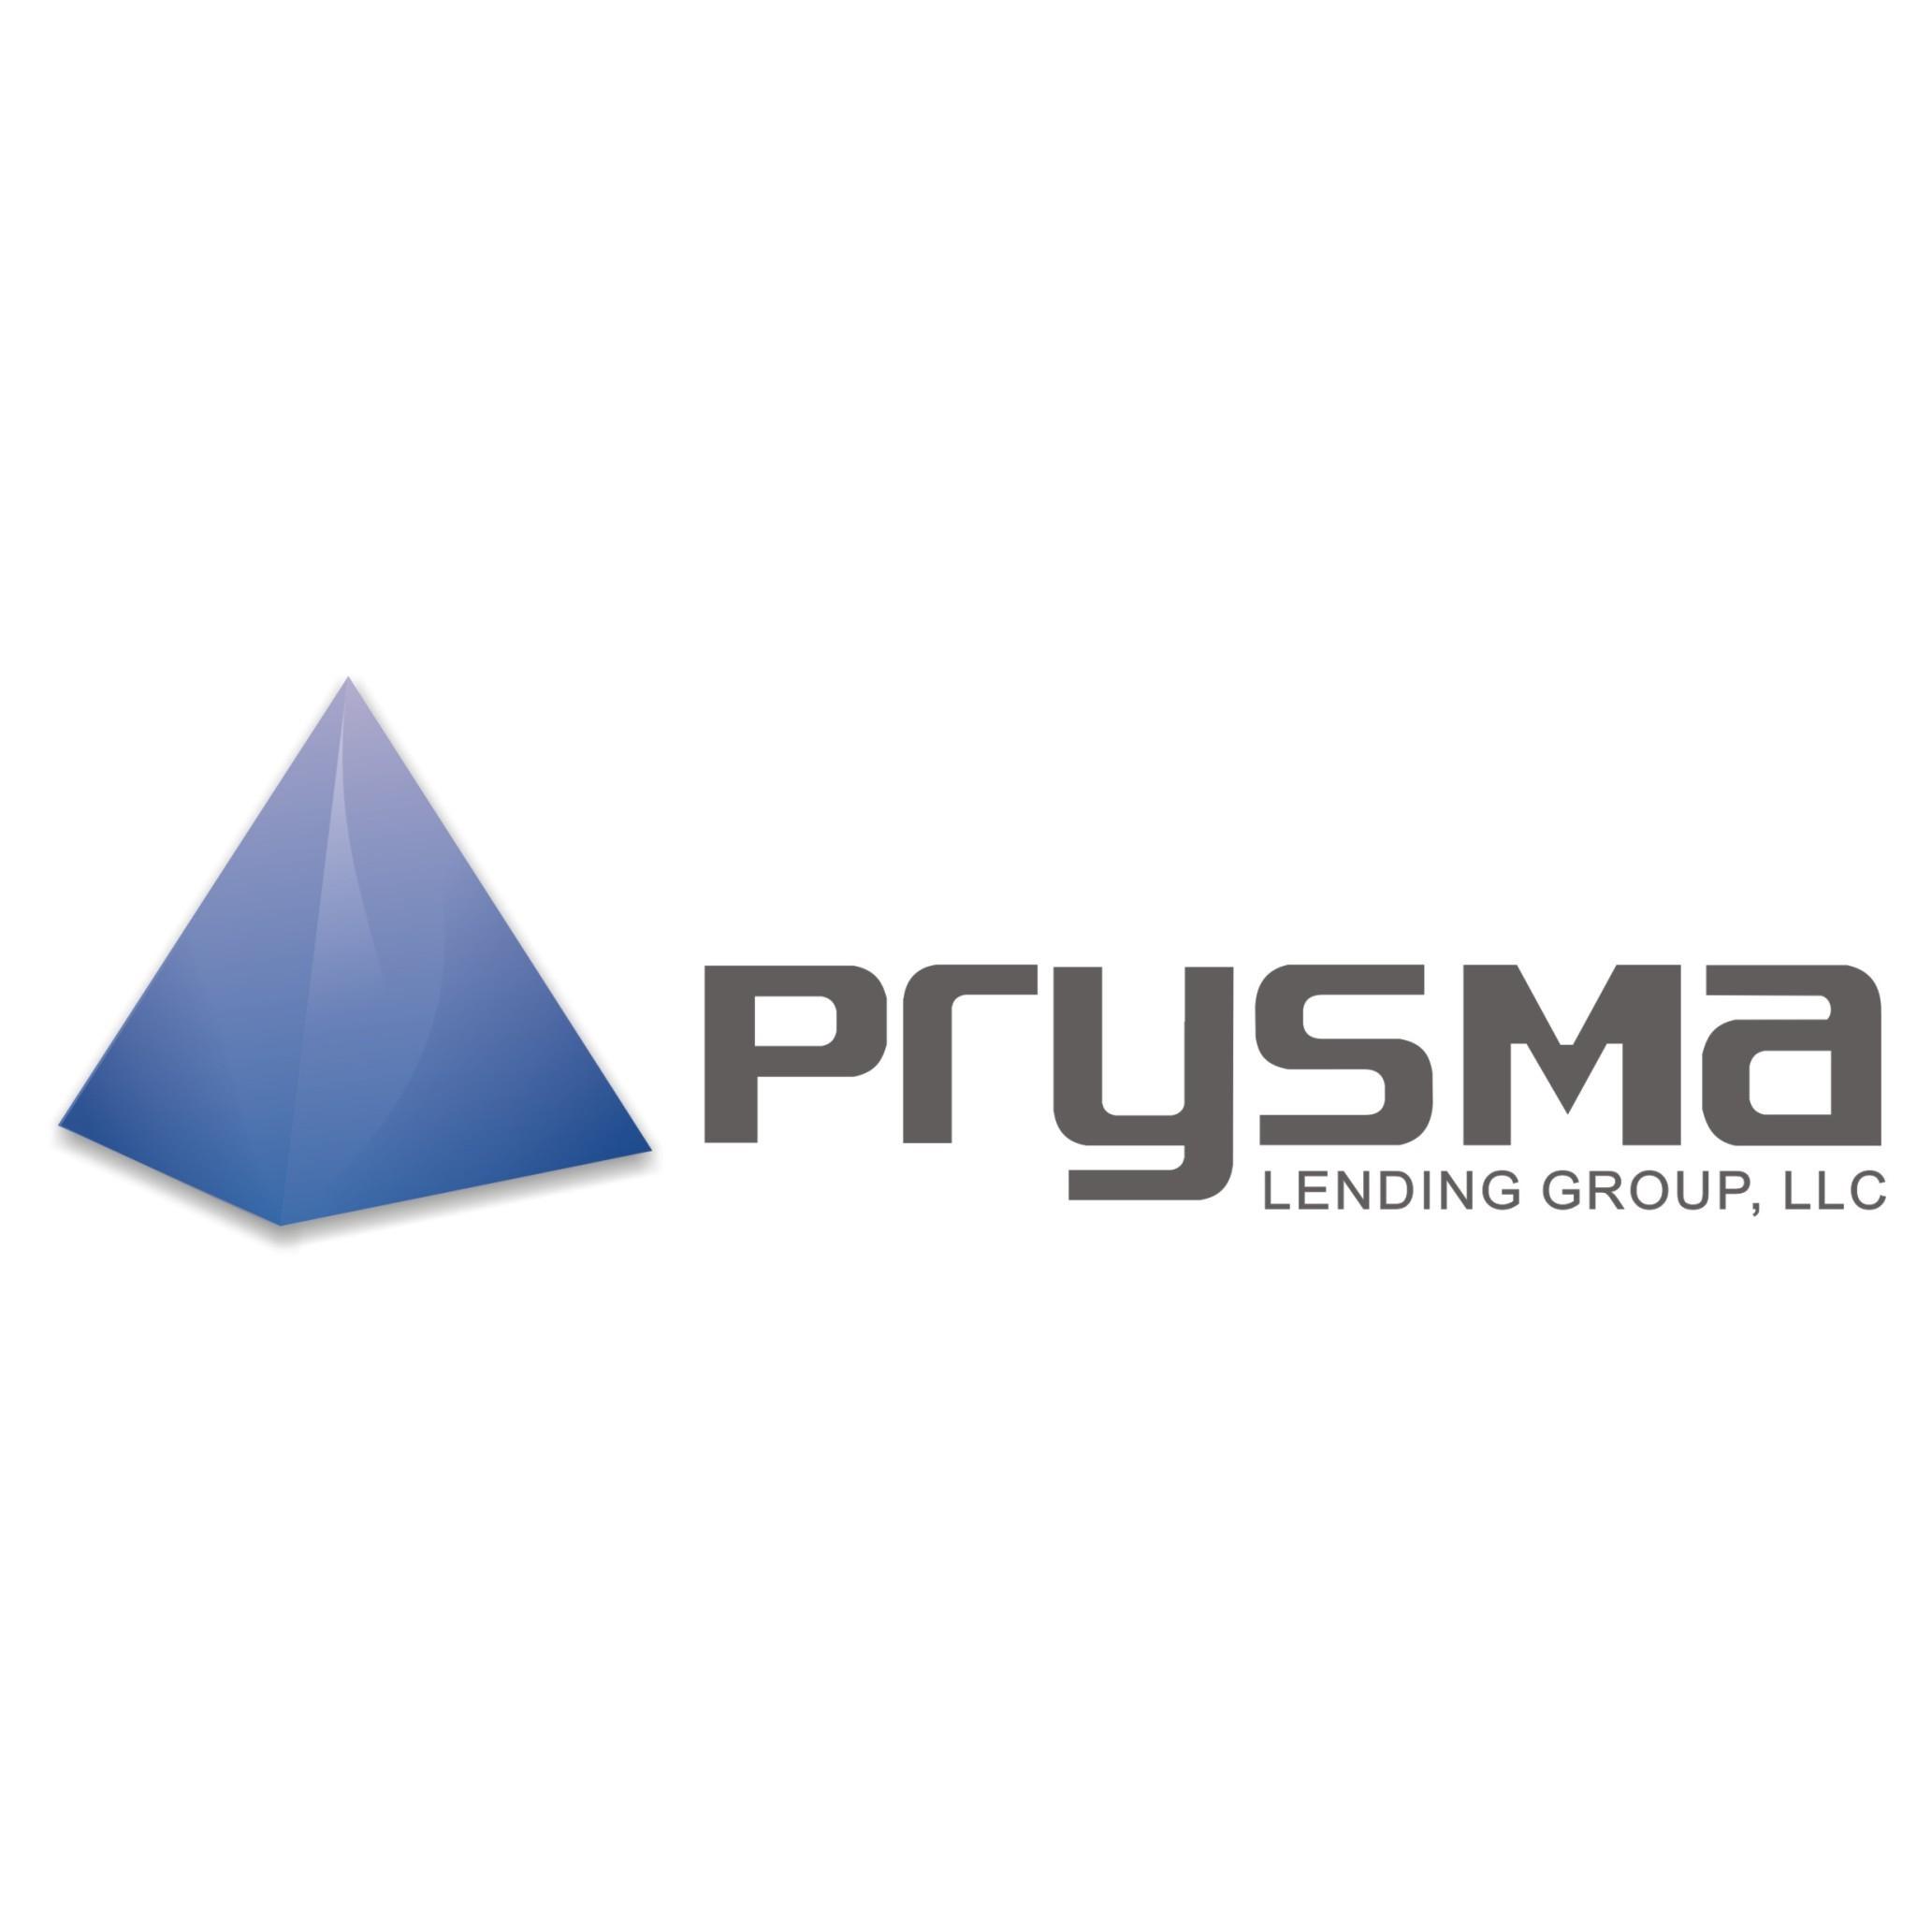 Prysma Lending Group, LLC